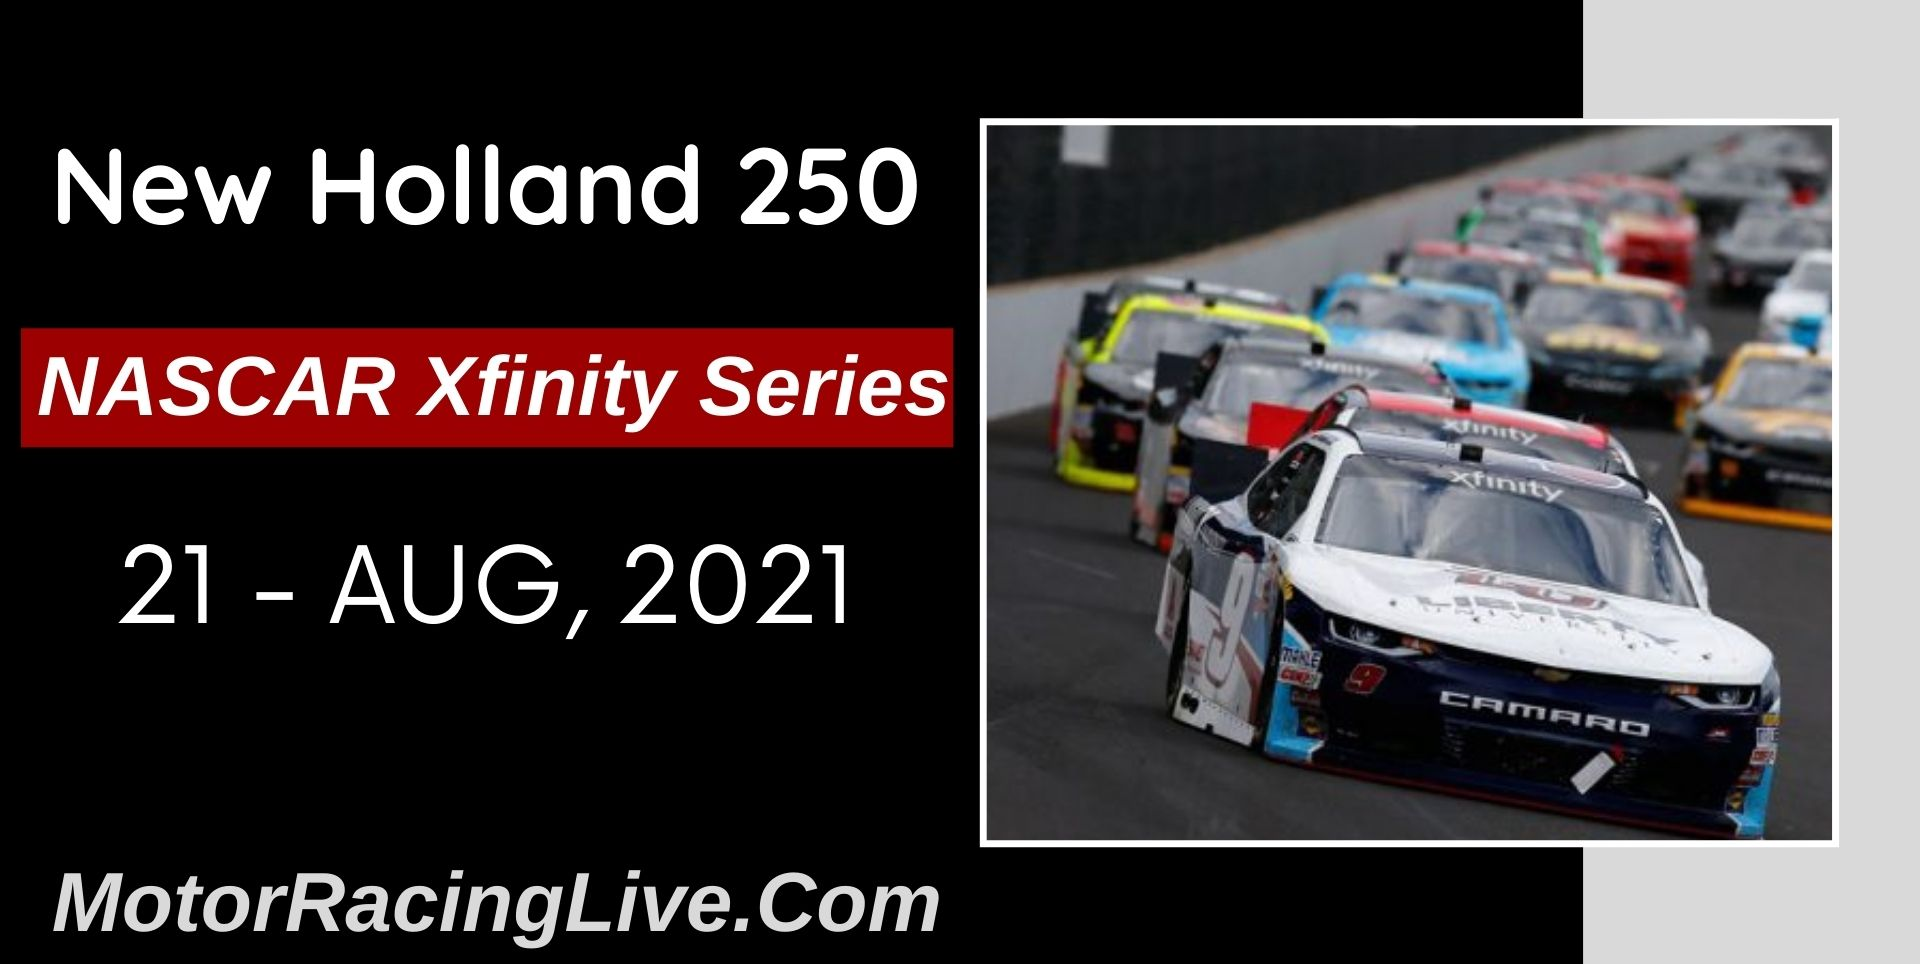 New Holland 250 Live Stream 2021: NASCAR Xfinity Series